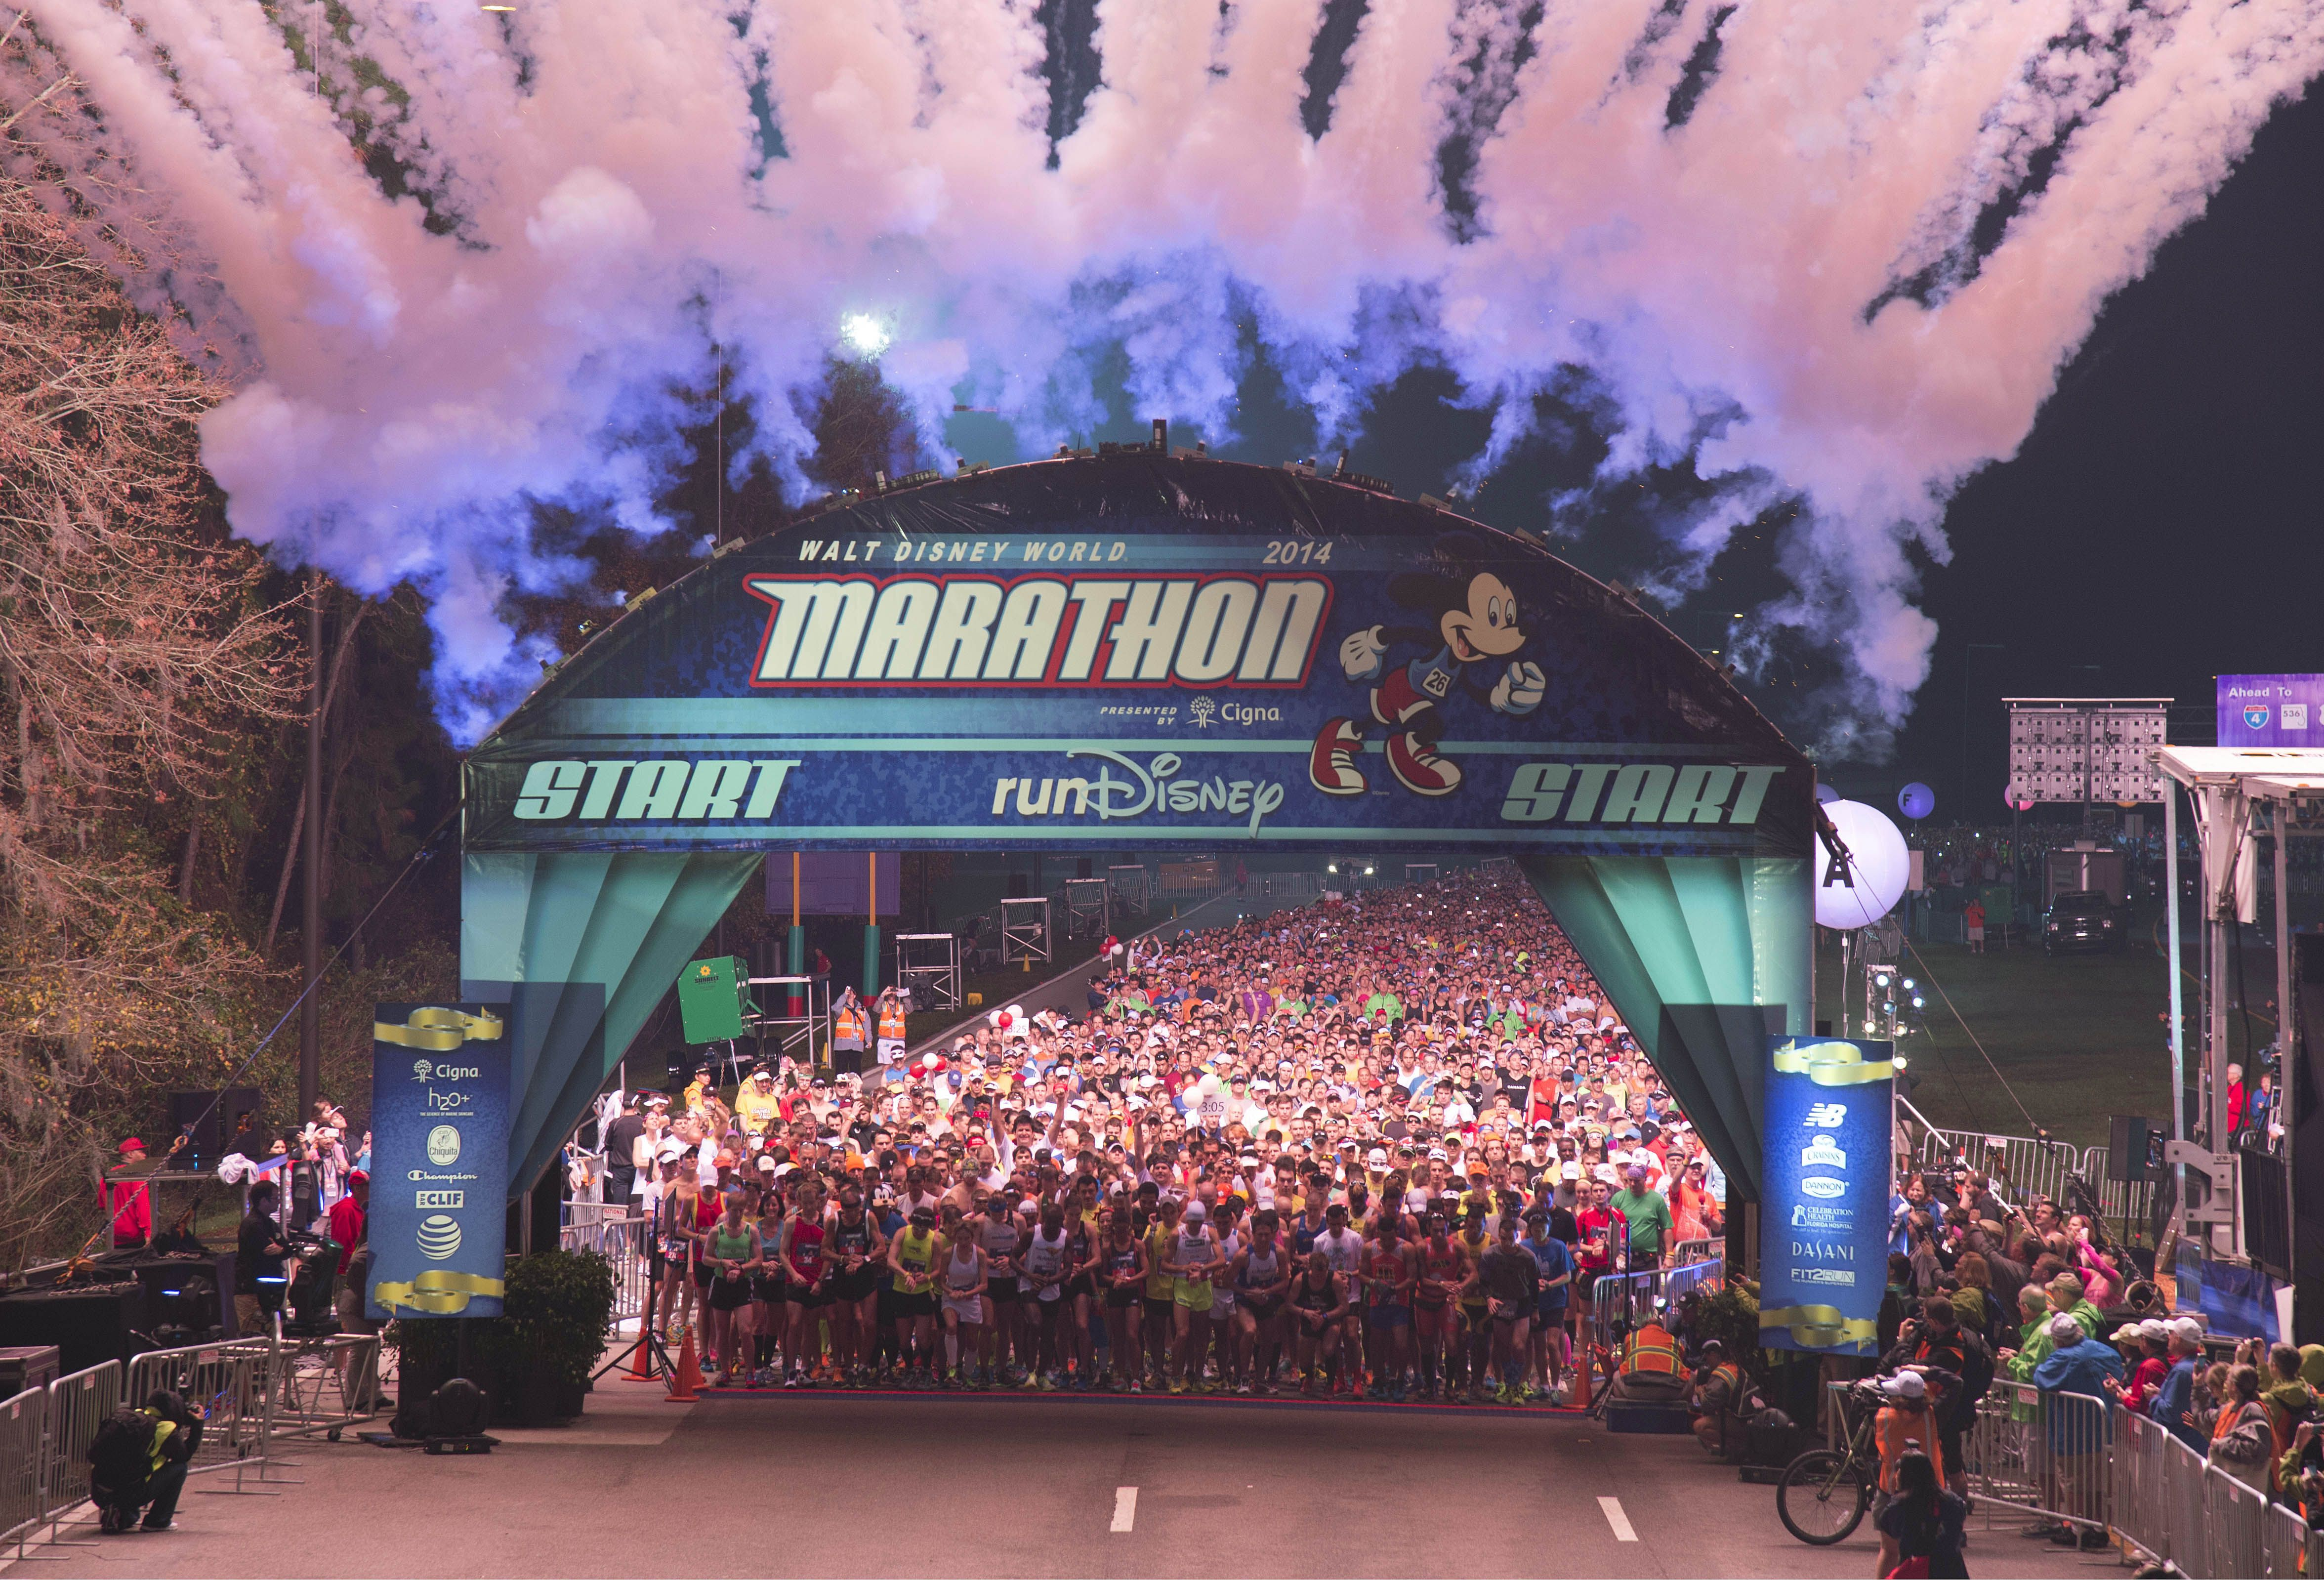 Línea de salida del Maratón de Walt Disney World 2014